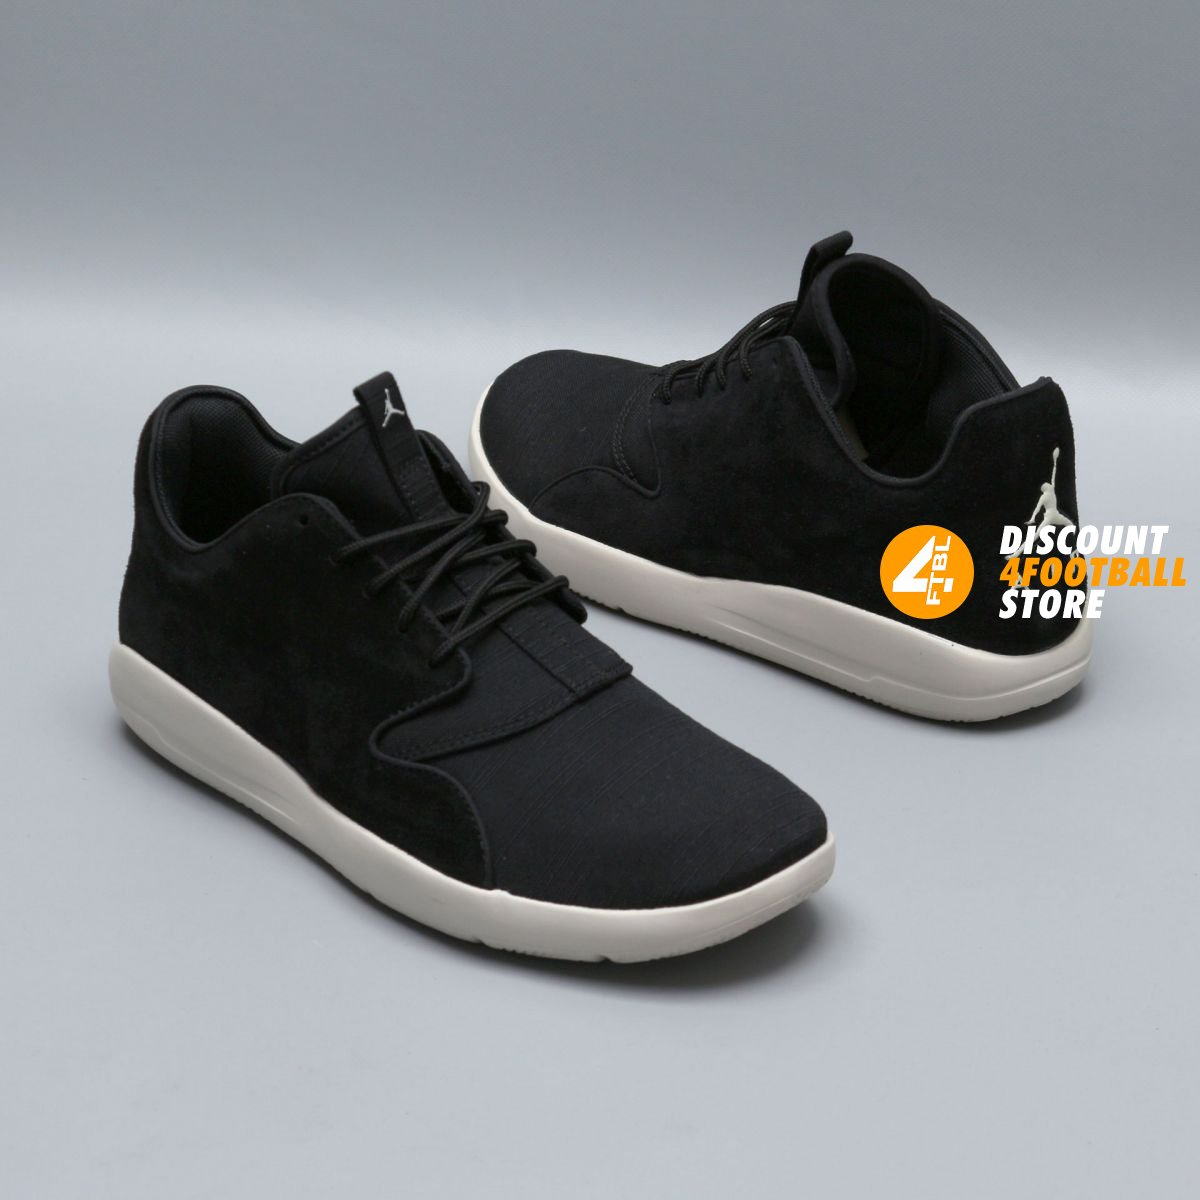 7ab1878f2d7b Мужские кроссовки Nike Jordan Eclipse LEA | 724368-013 купить у ...